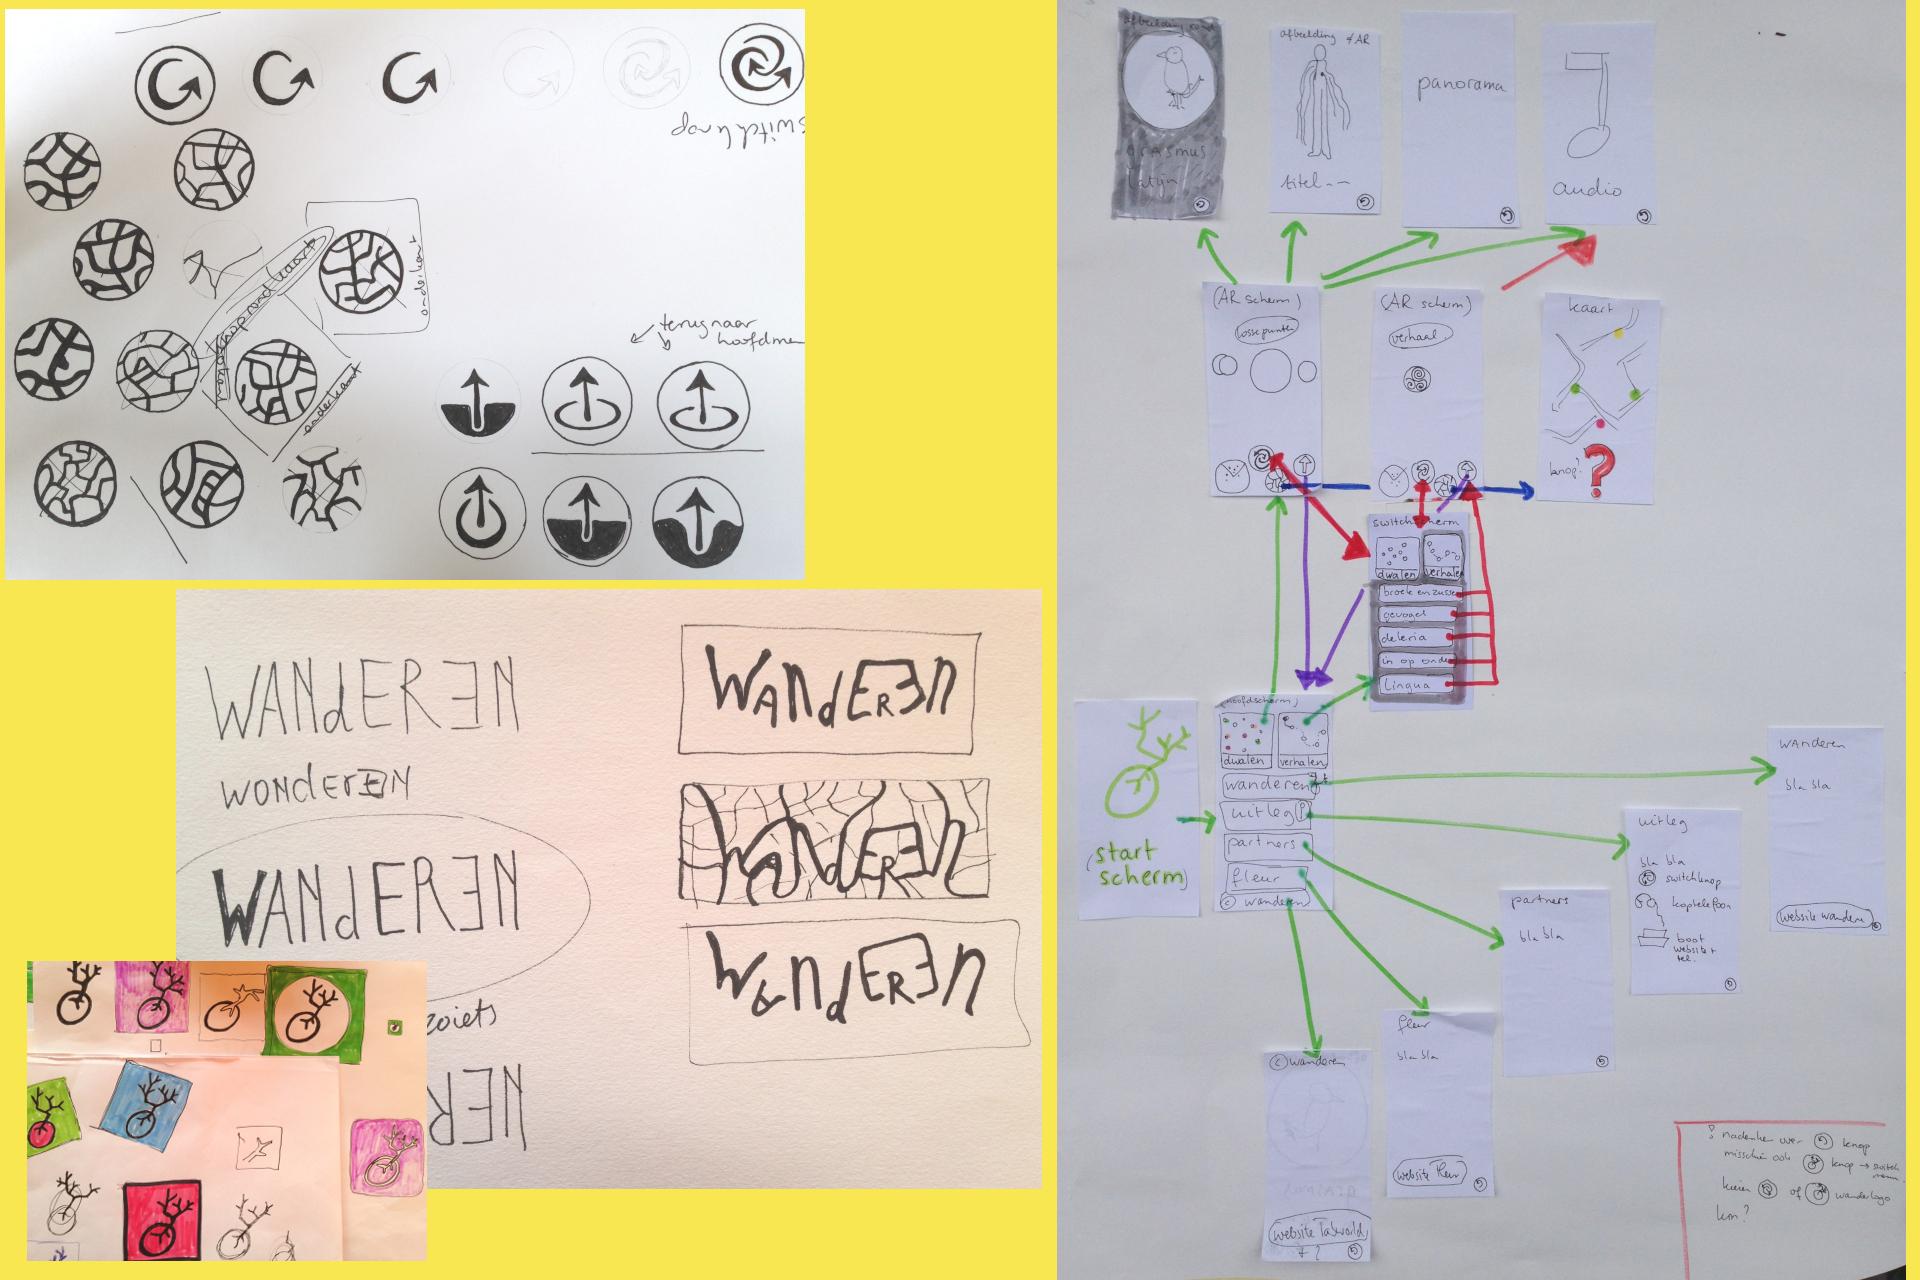 ontwerpproces app